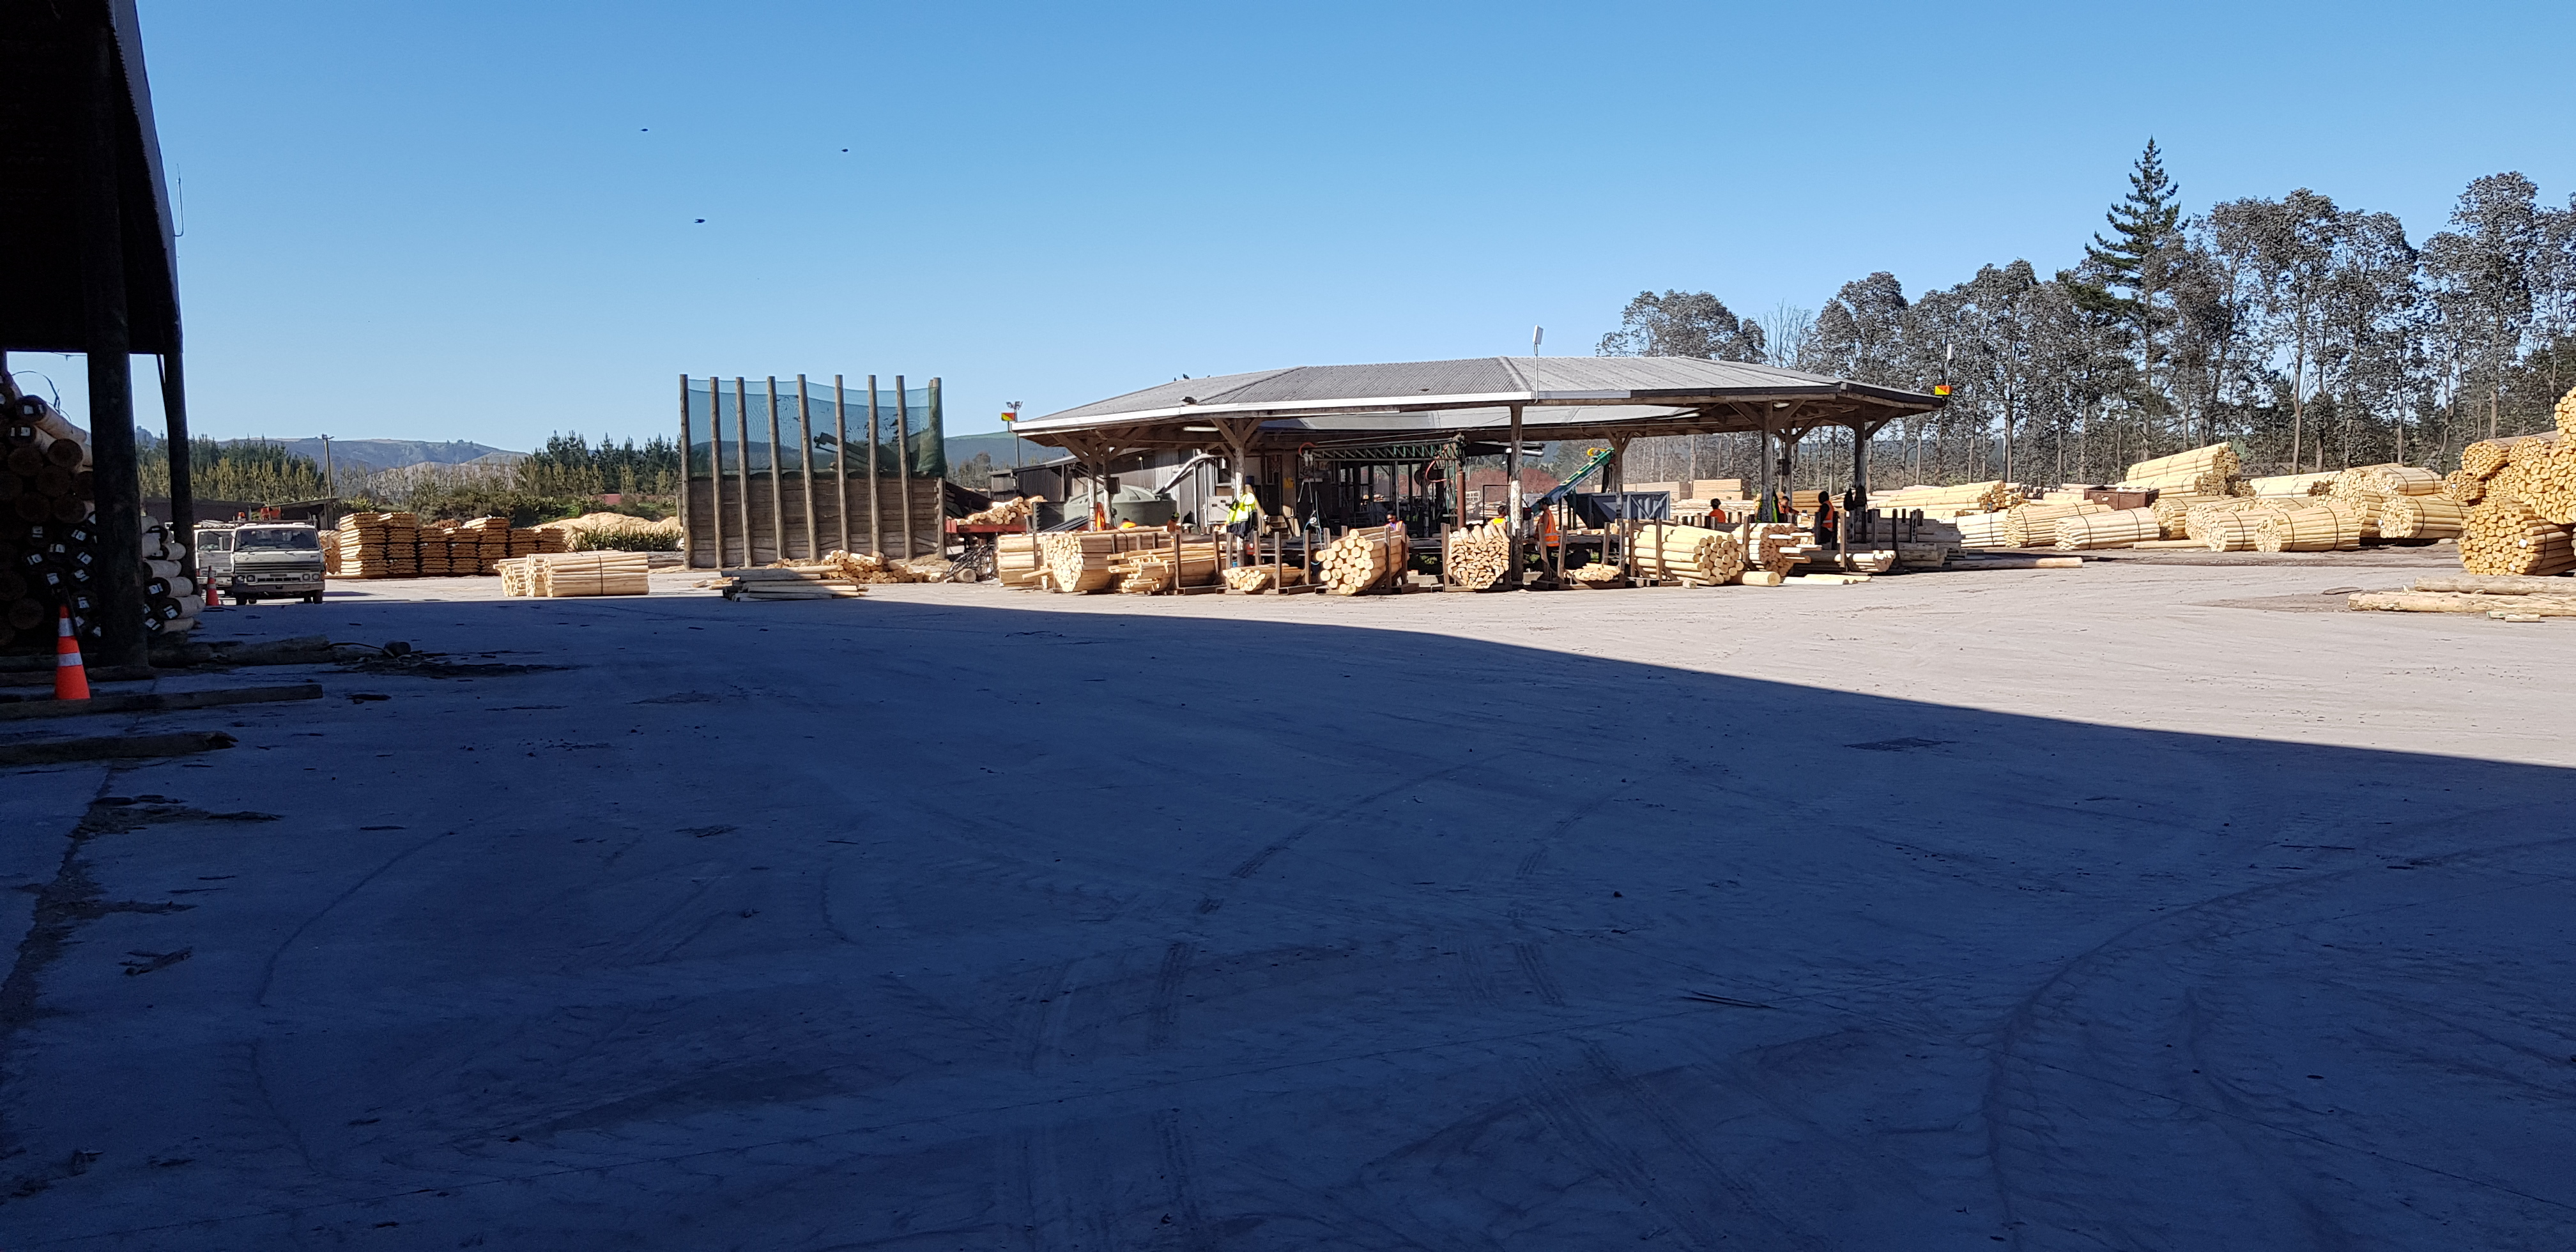 Outdoor yard over a hardwearing concrete fibre reinforced slab